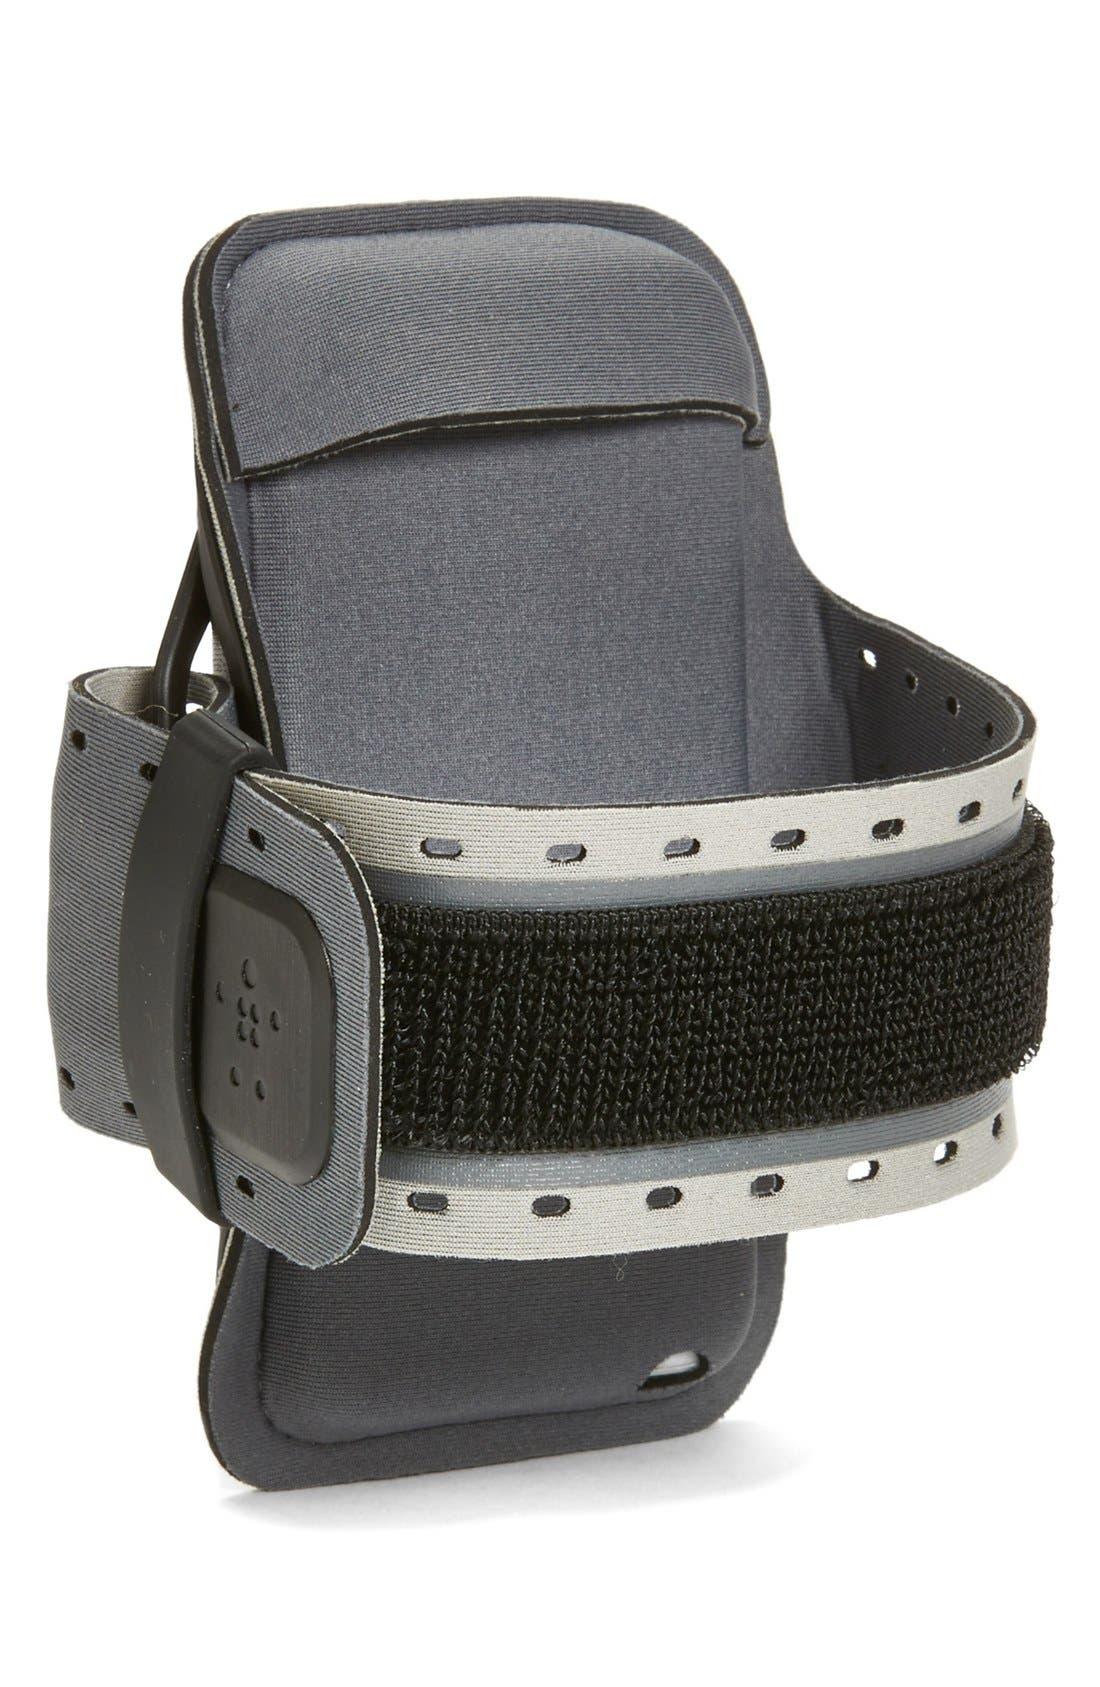 Alternate Image 2  - Belkin Slim-Fit Plus iPhone 5 Armband